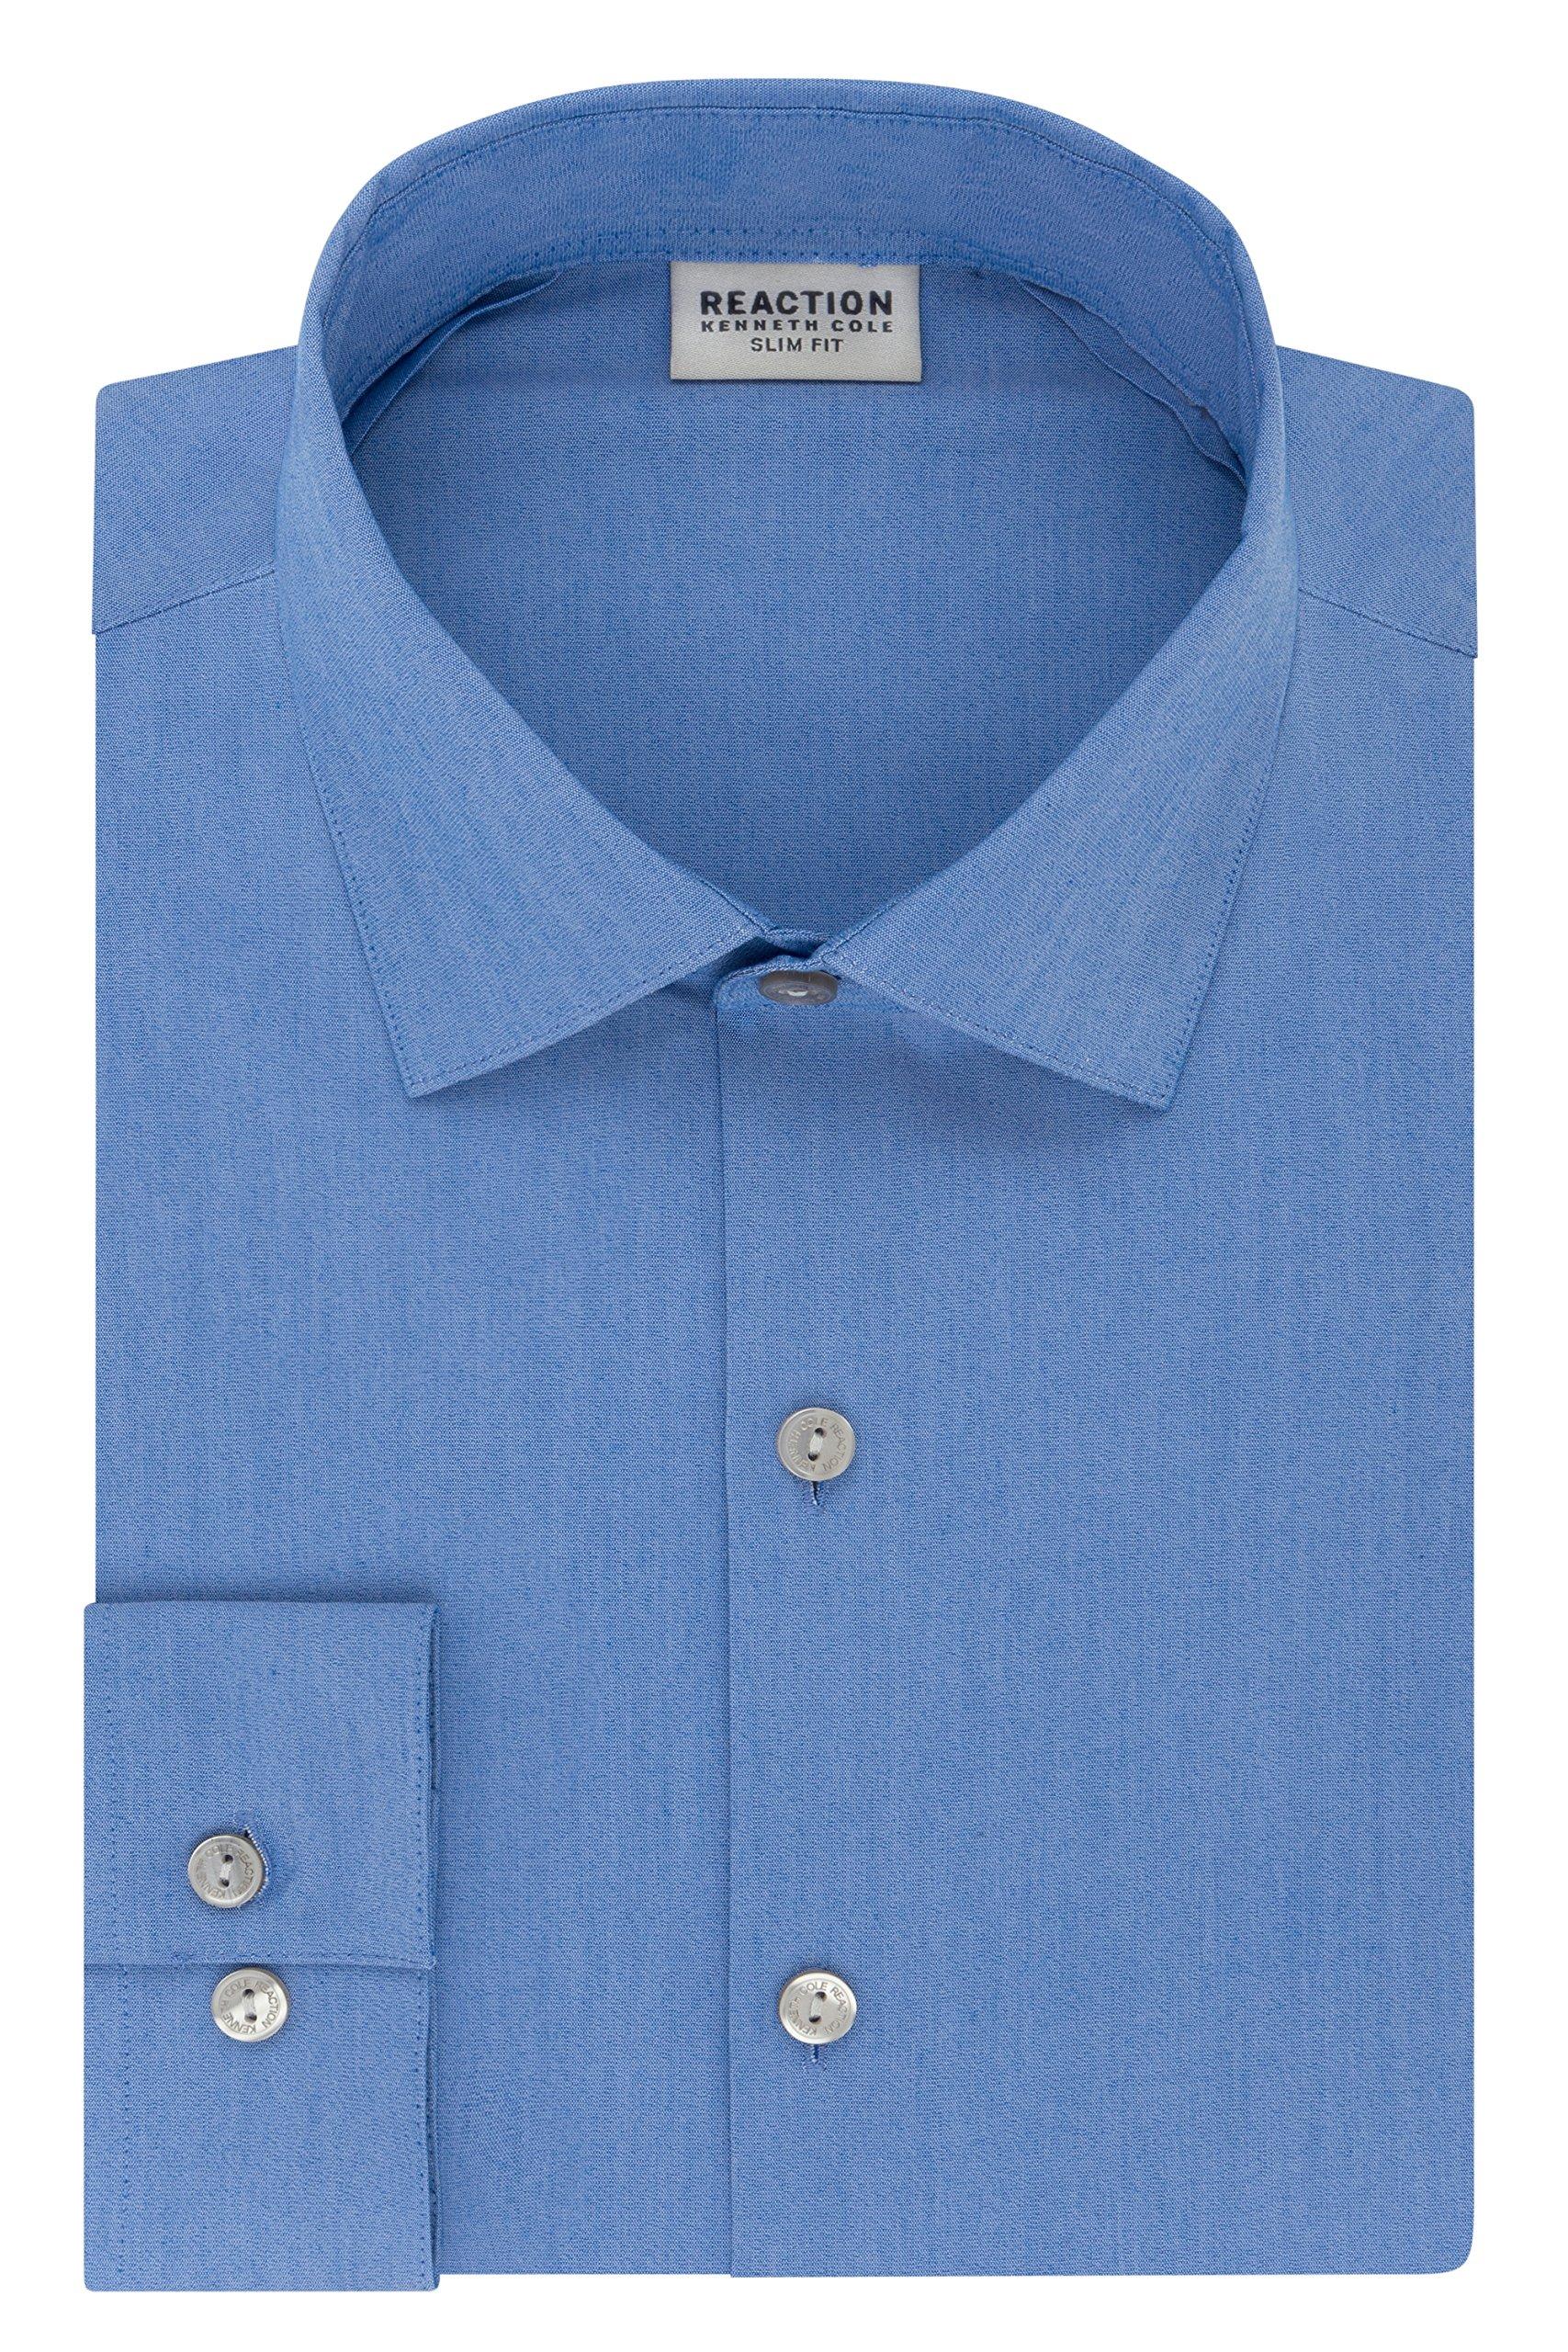 Kenneth Cole REACTION Men's Technicole Slim Fit Solid Spread Collar Dress Shirt, Multi/Blue, 15'' Neck 34''-35'' Sleeve